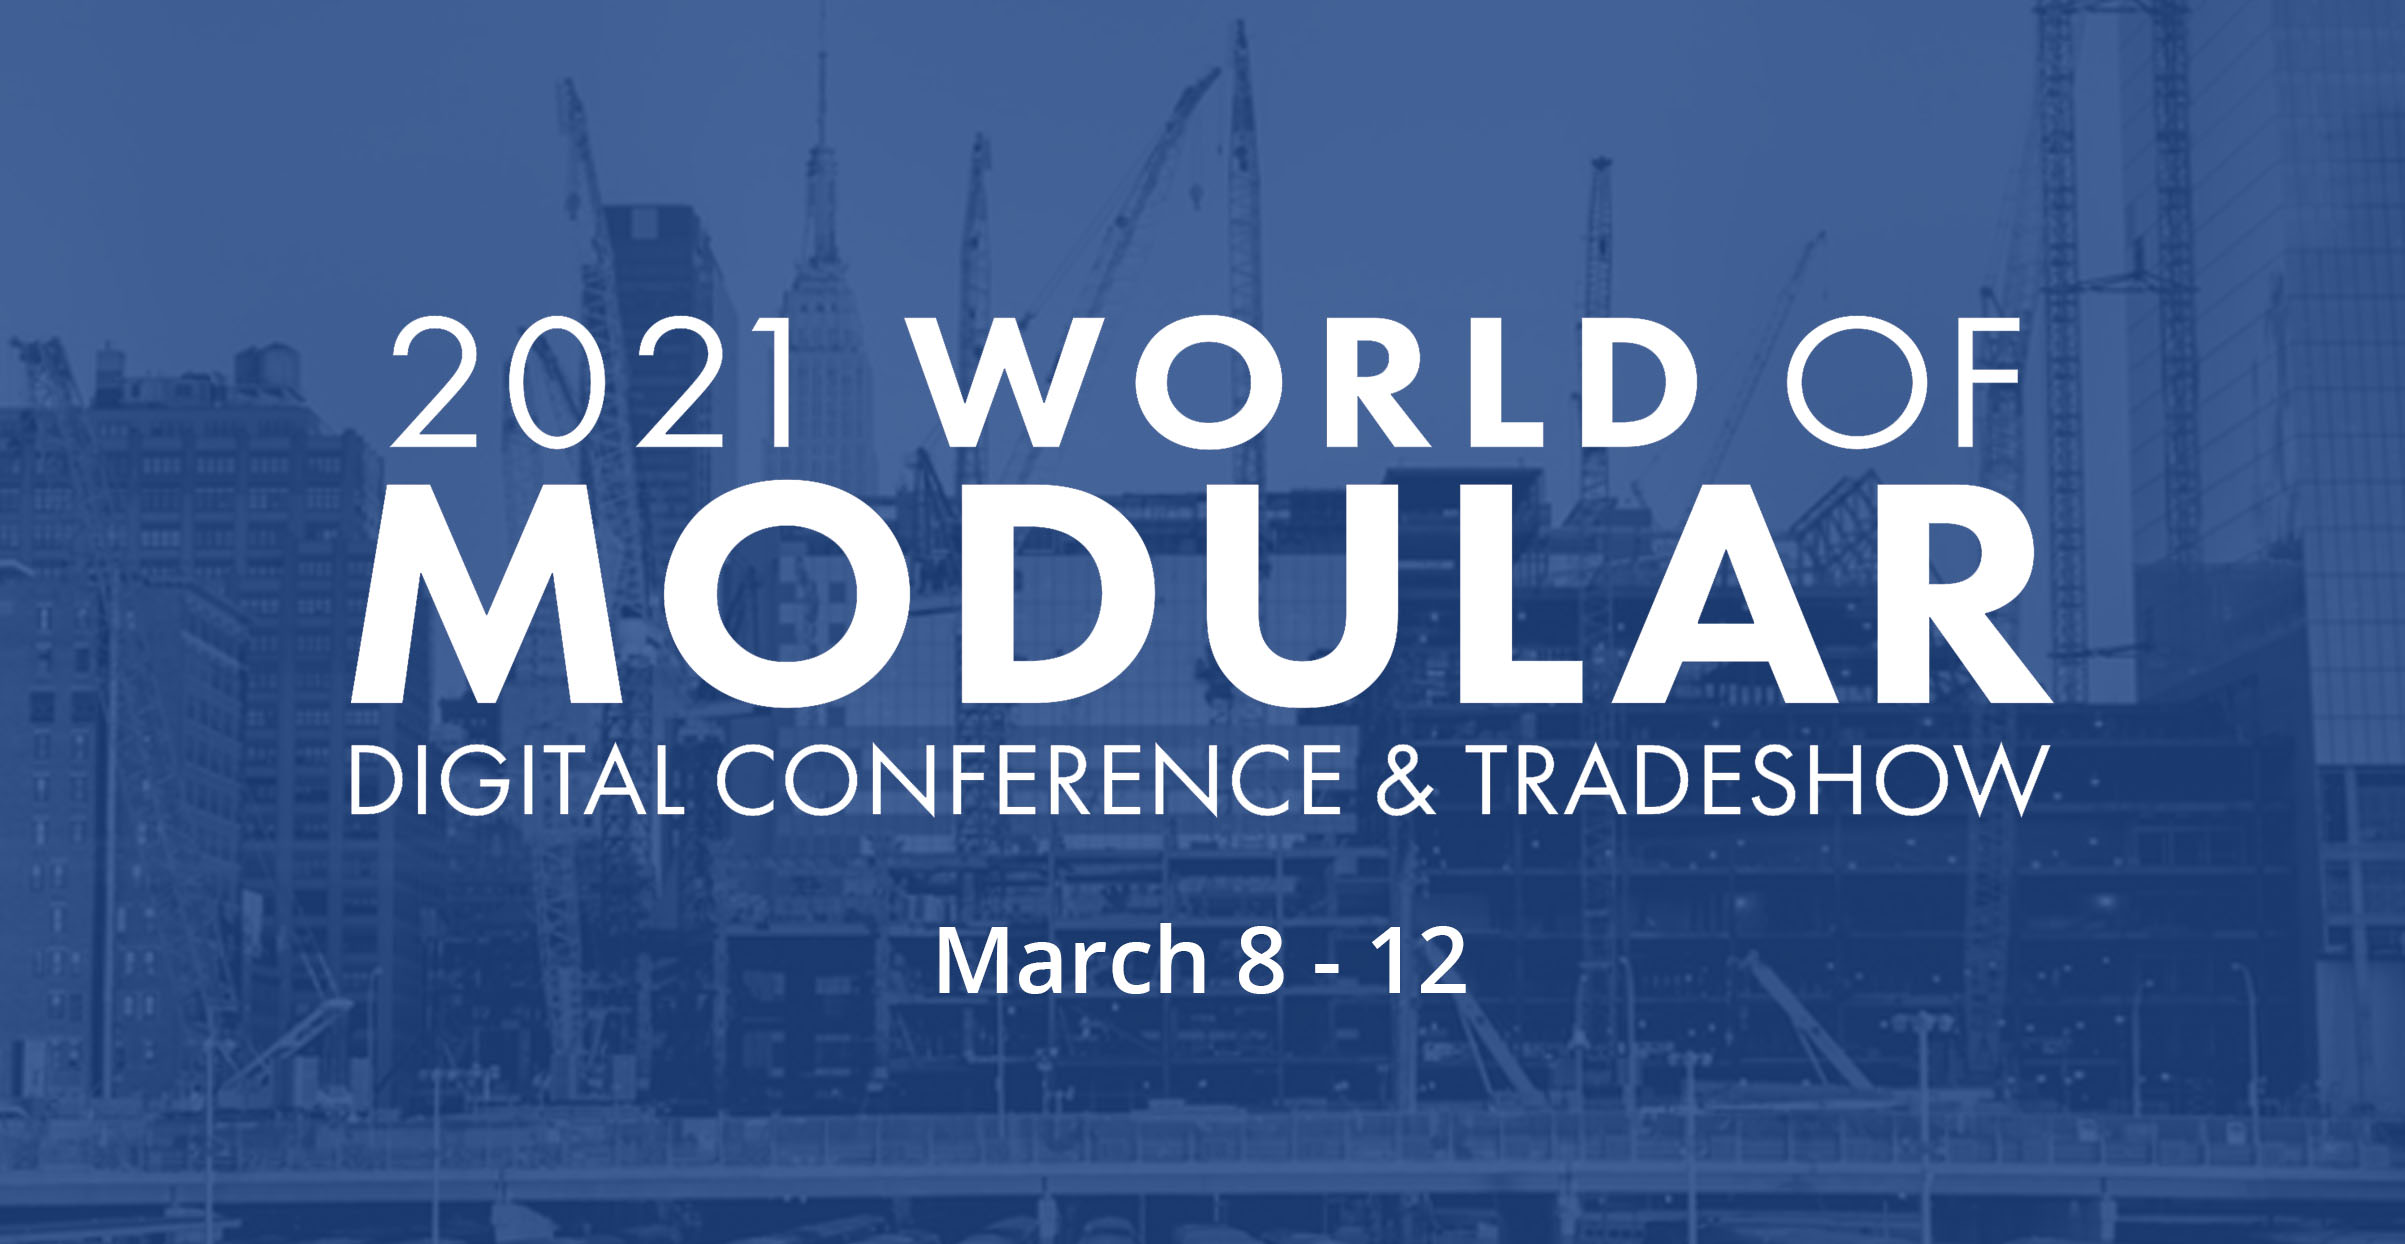 World of Modular 2021